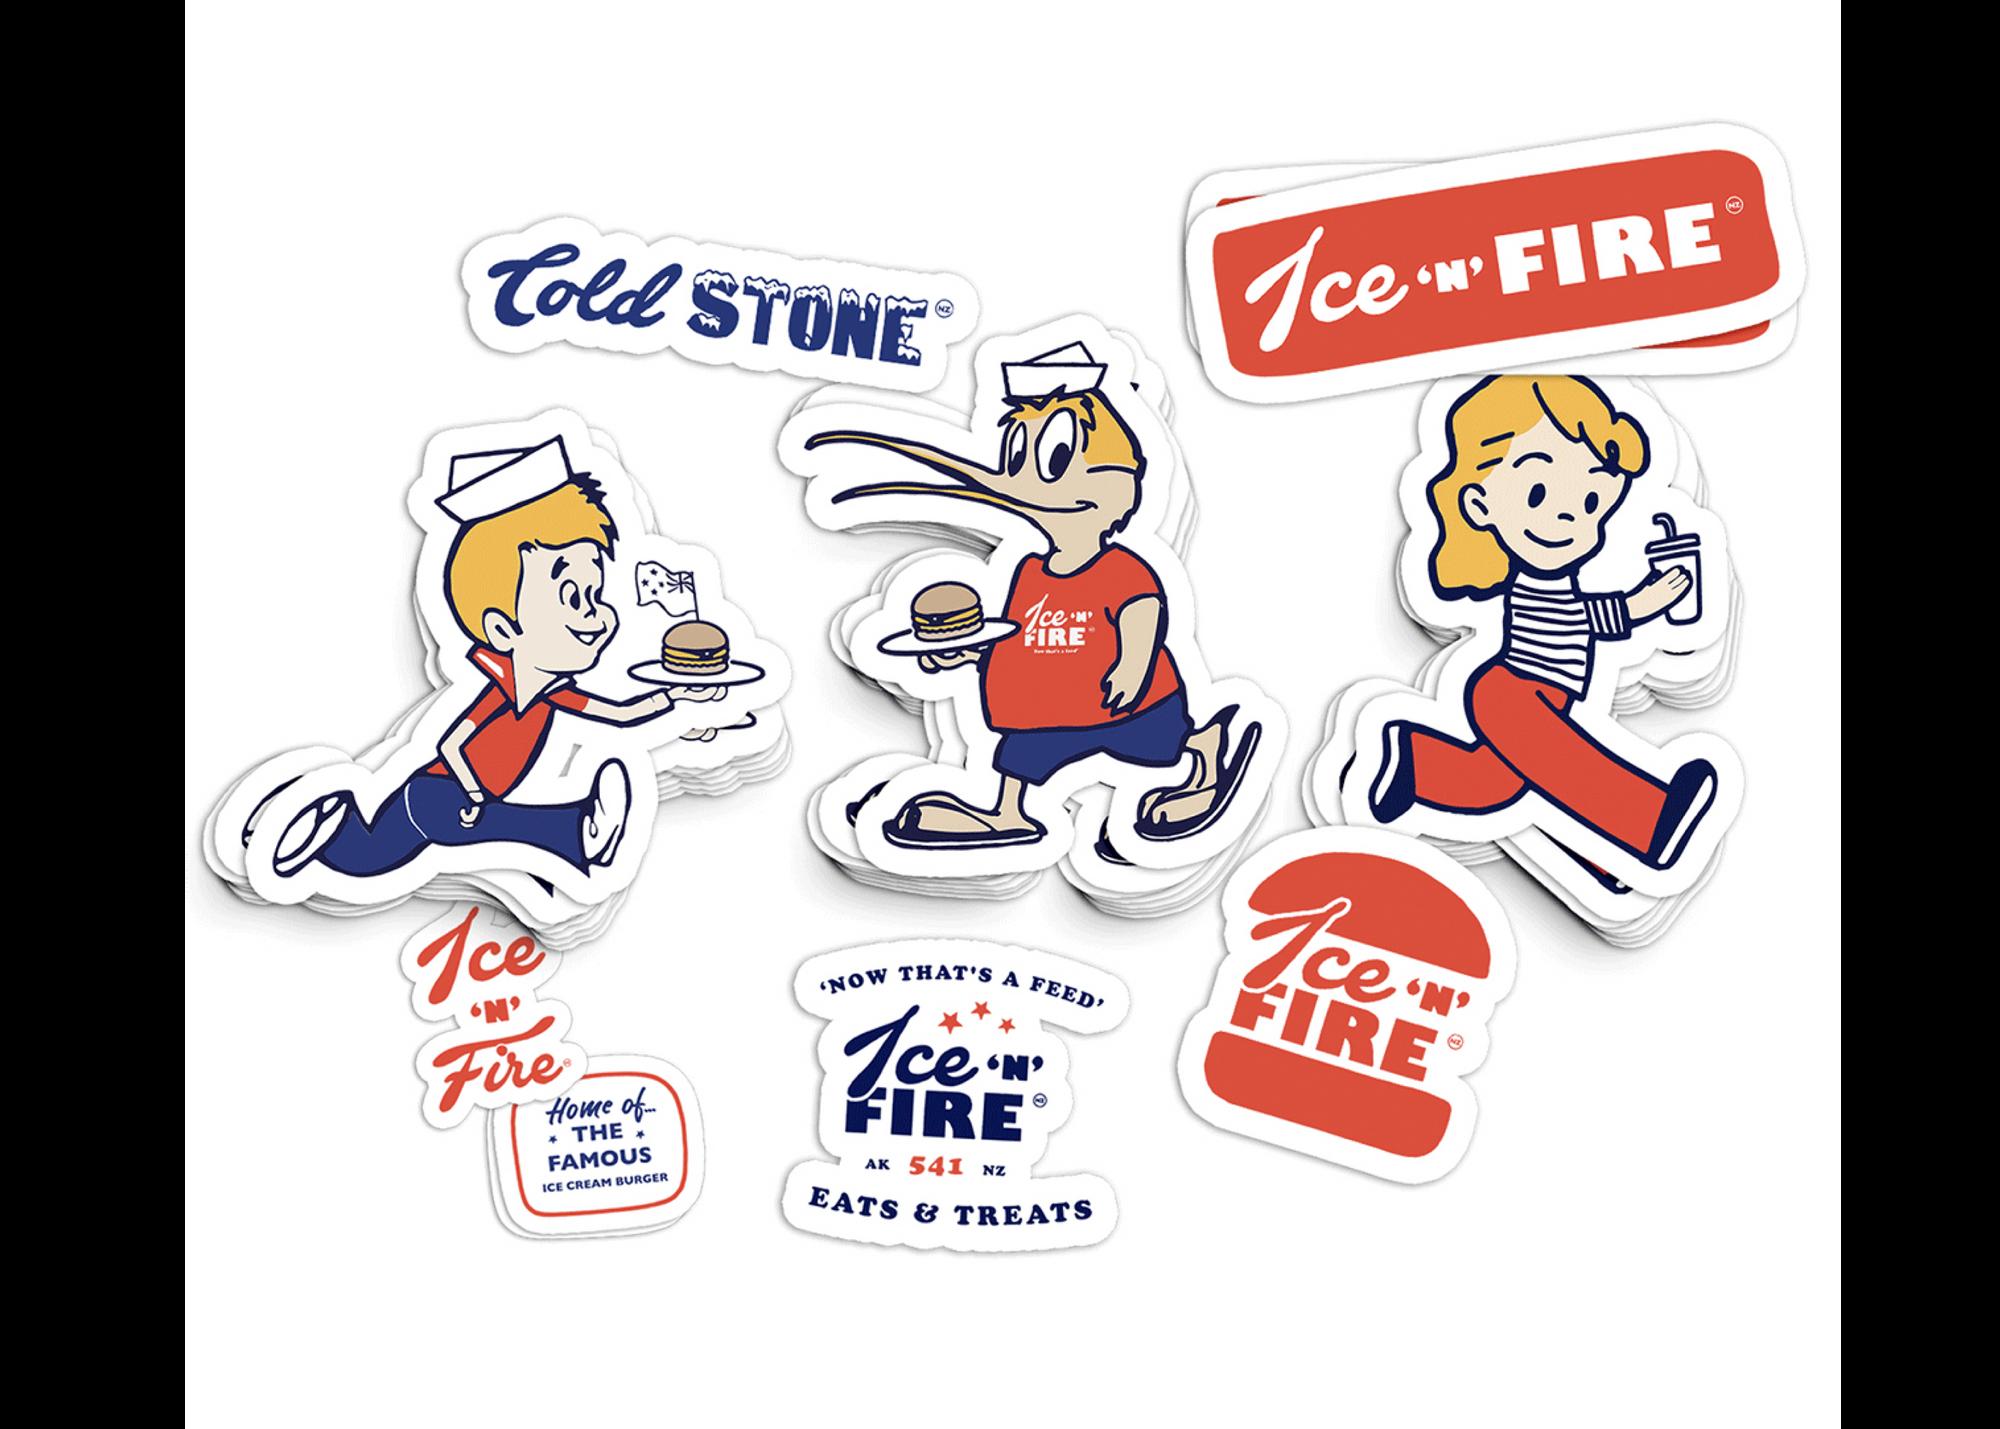 Ice & Fire - digital marketing